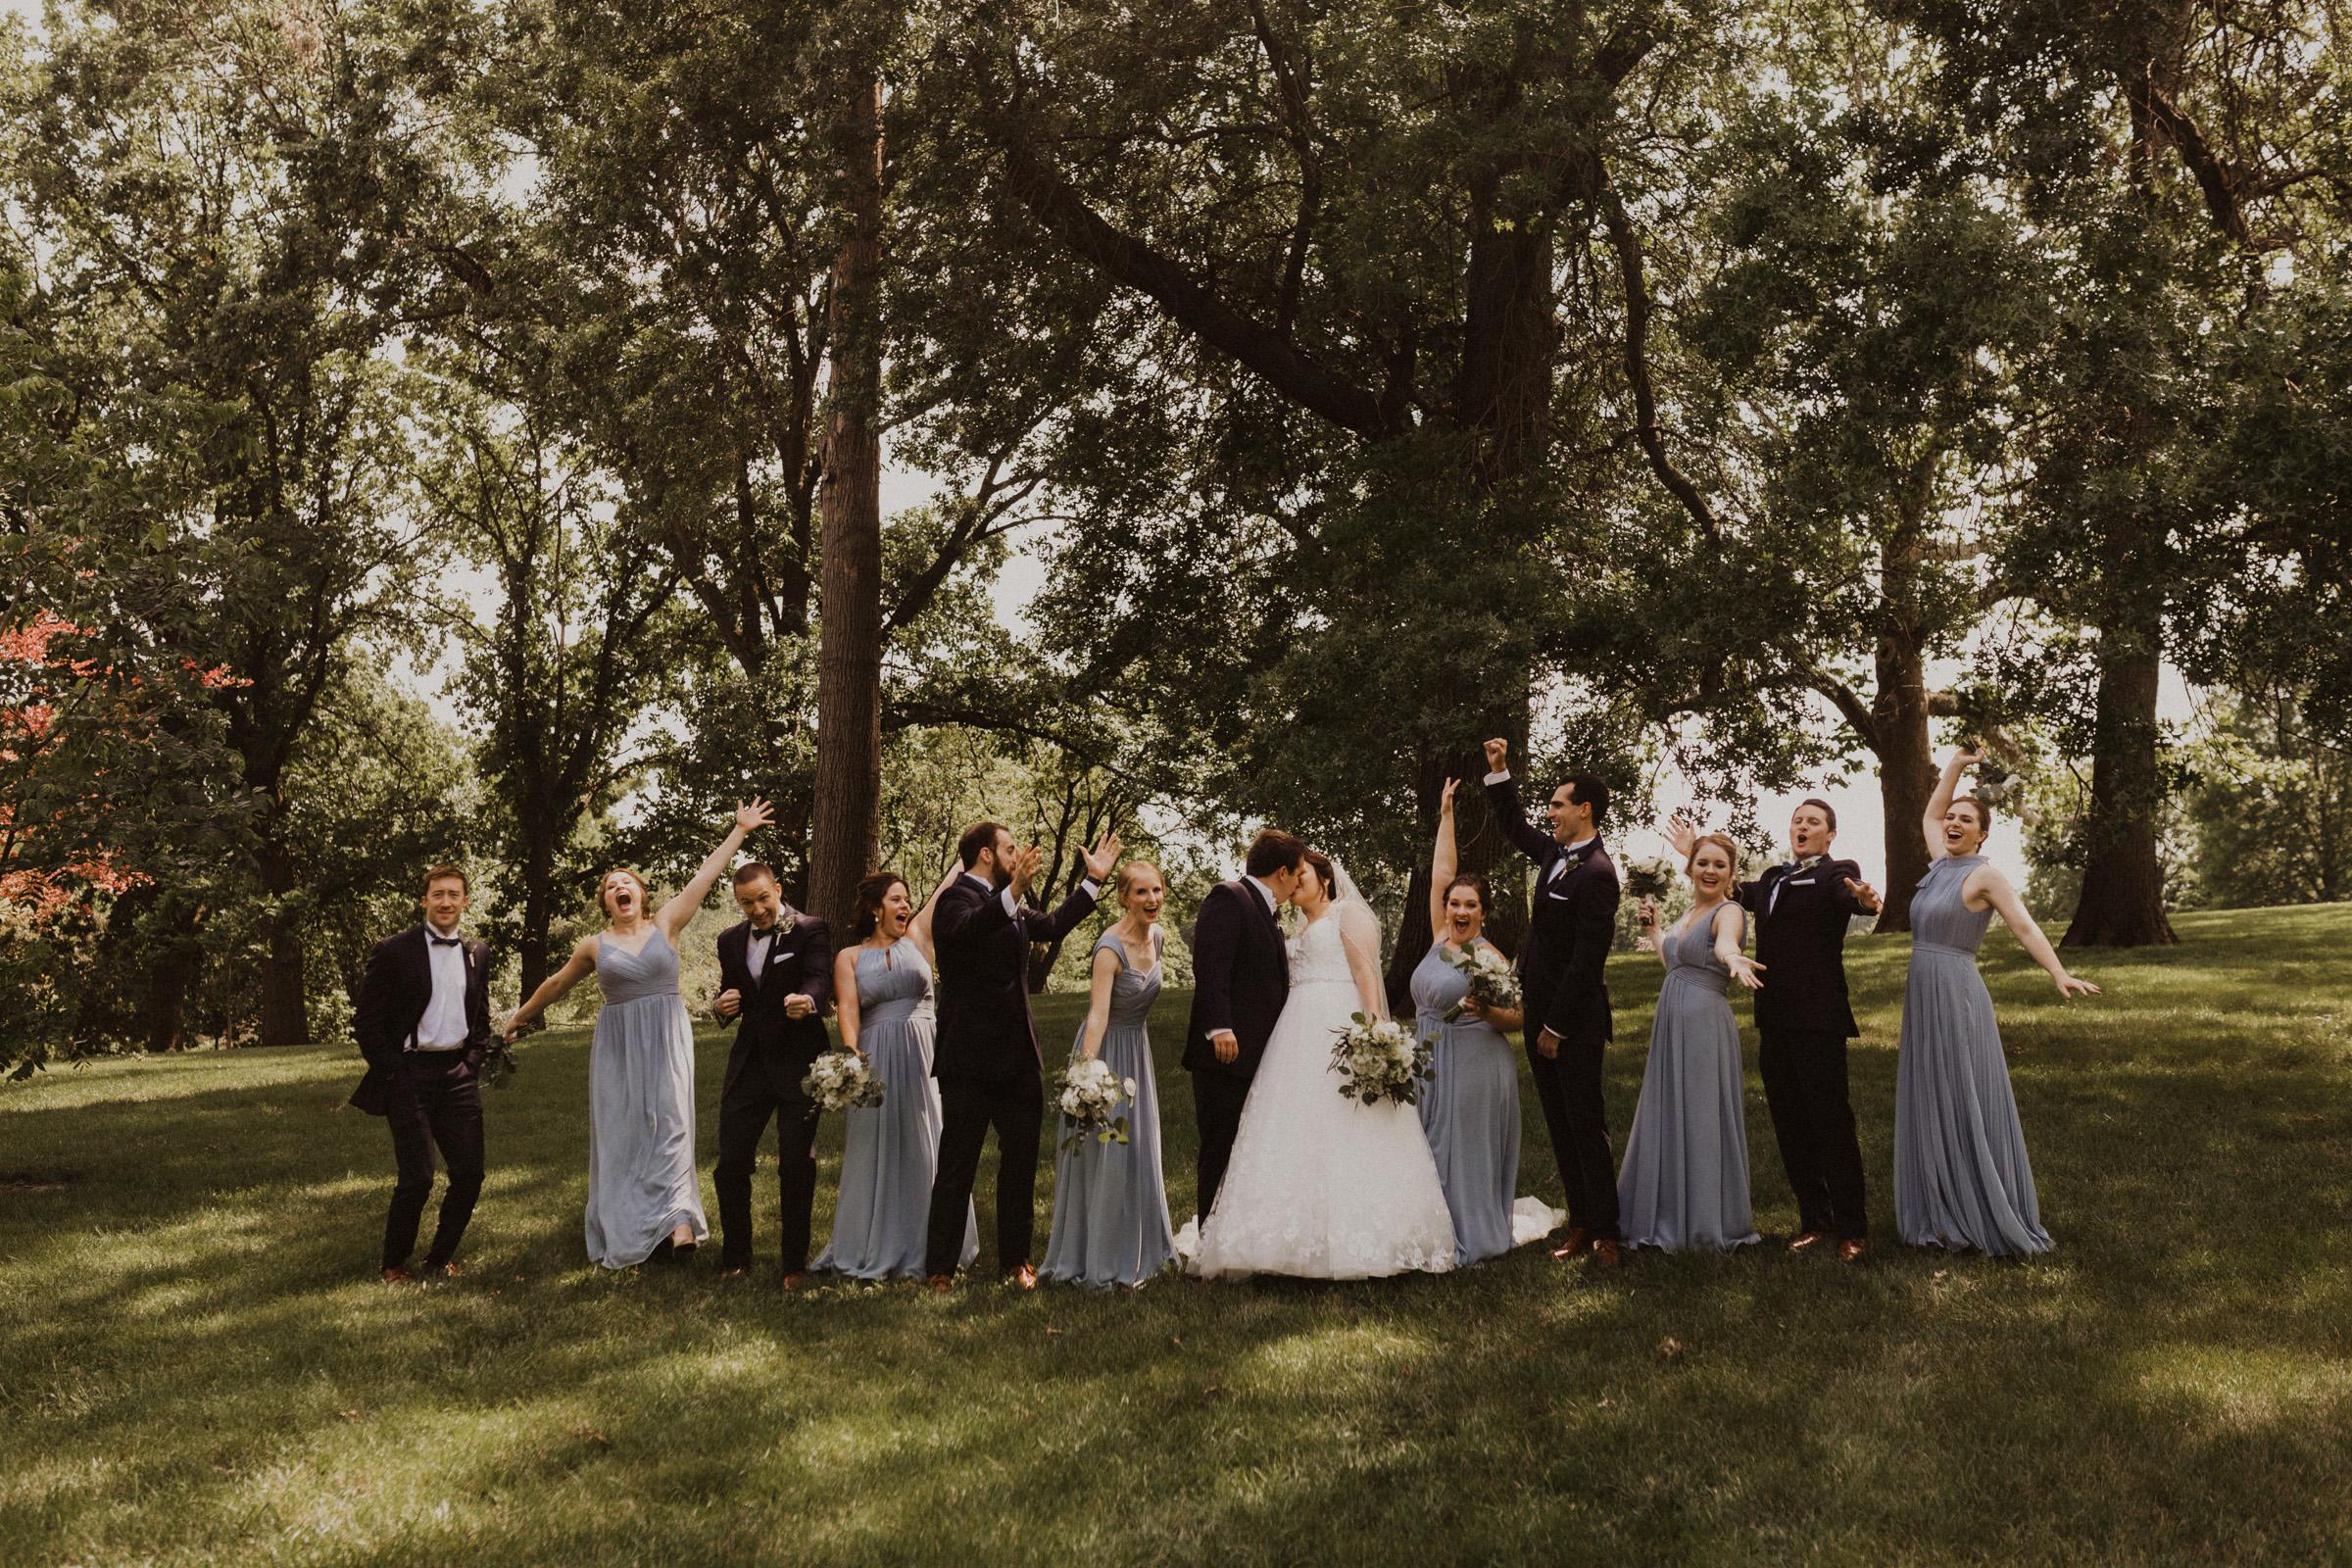 alyssa barletter photography classic kansas city wedding loose park plaza country club summer wedding-28.jpg